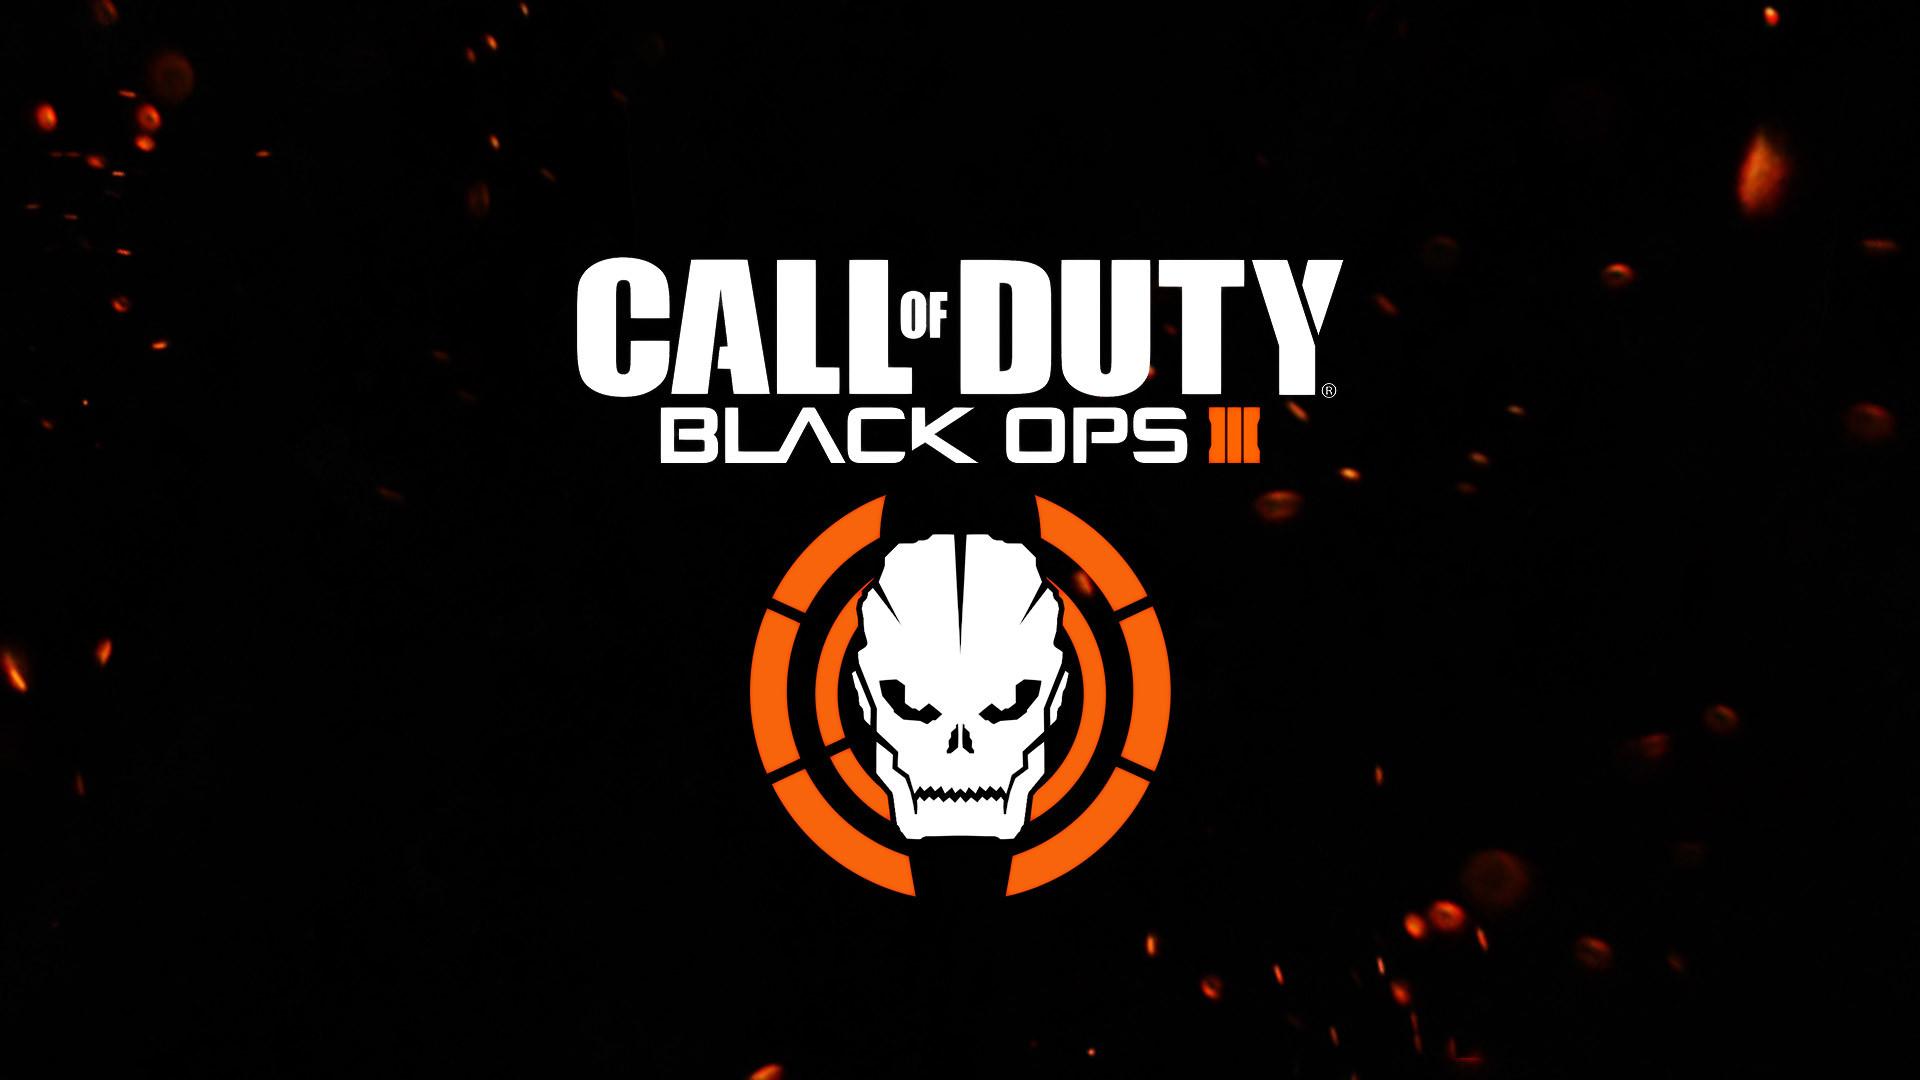 Black Ops 3 Phone Wallpaper Blacks Ops 3 Hd 1267113 Hd